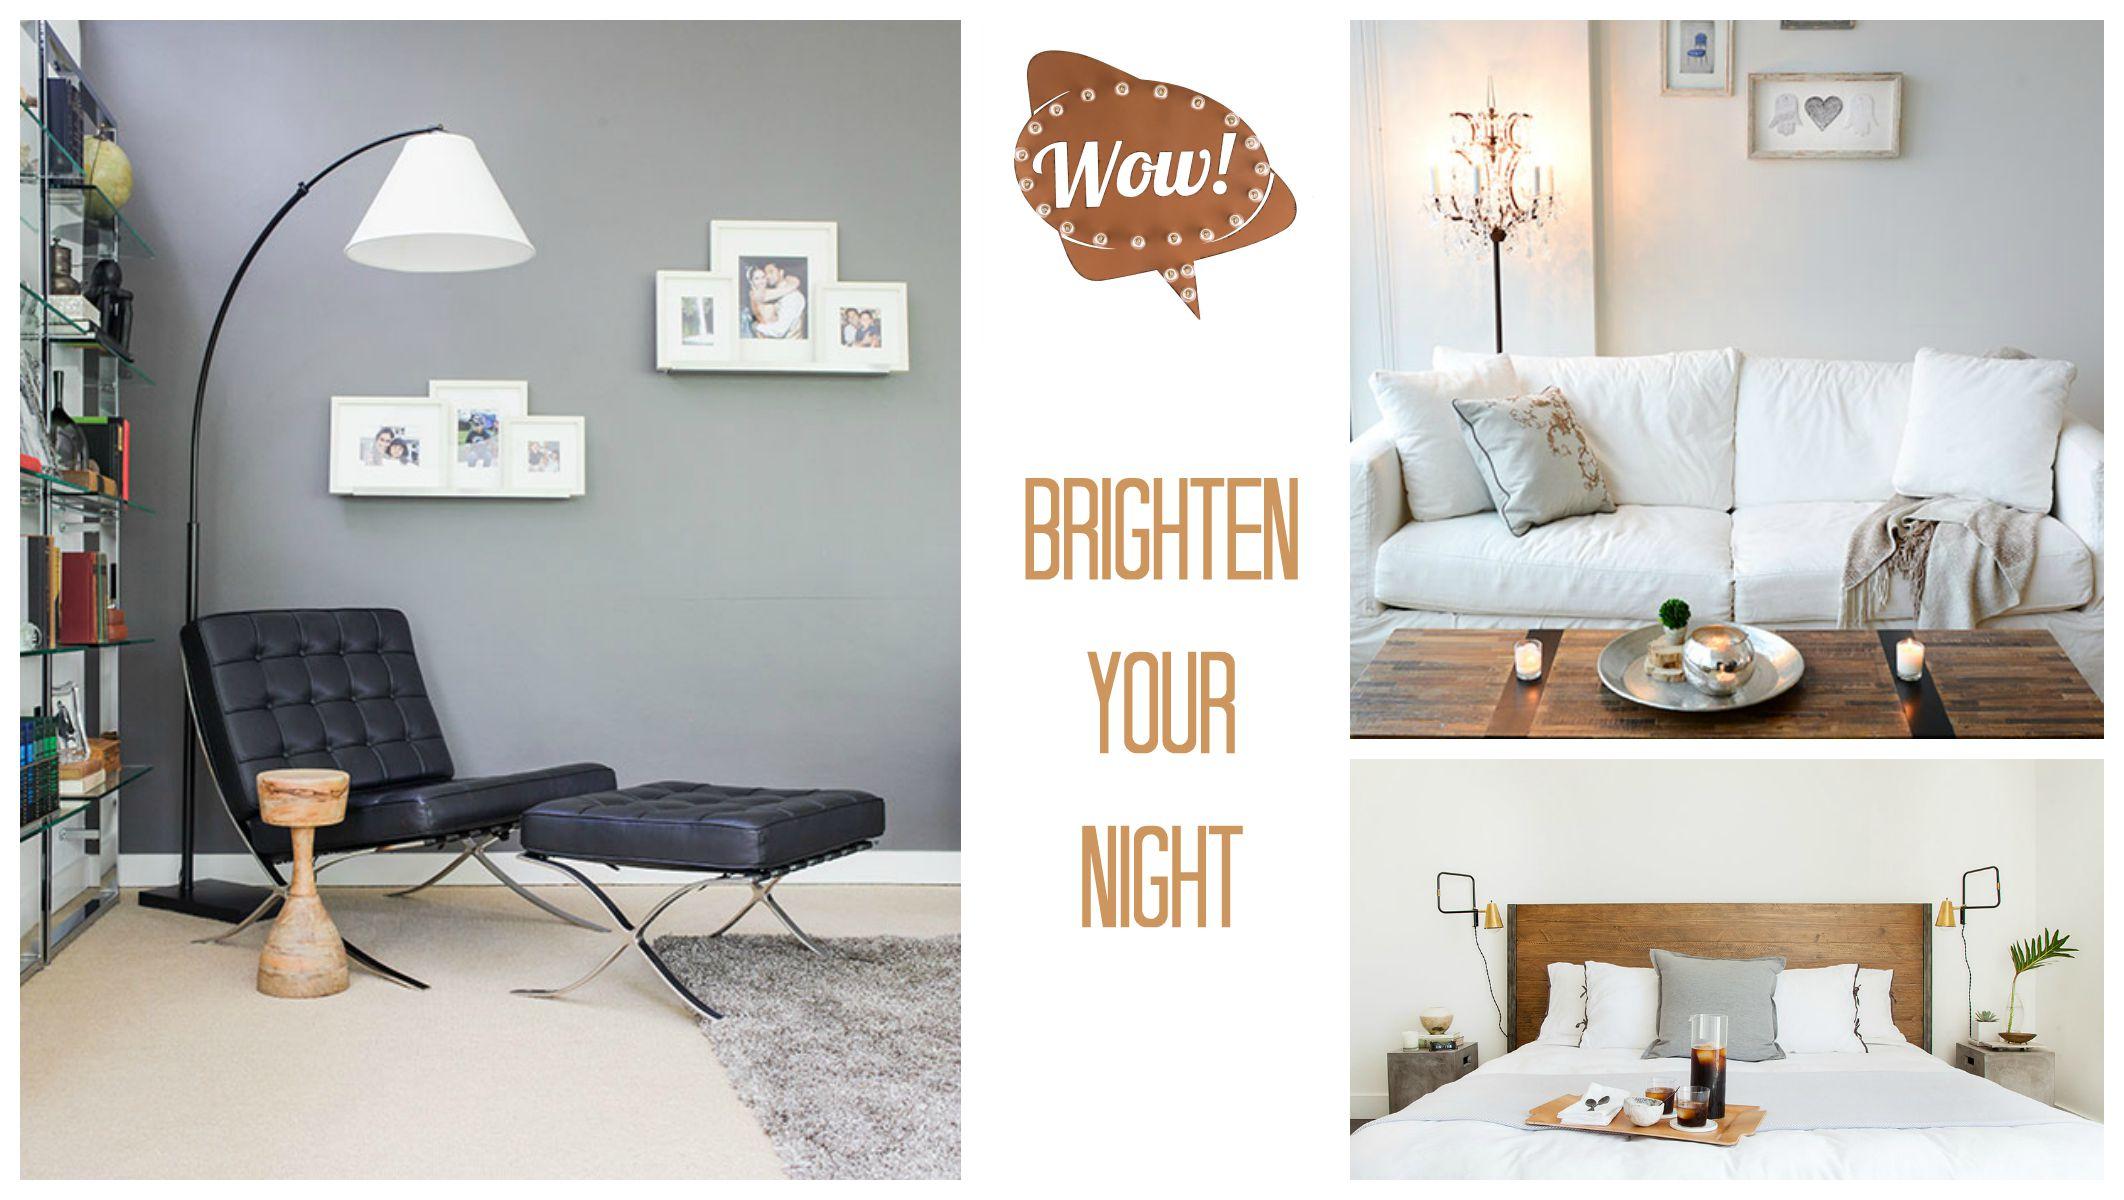 Home Lighting Brighten Your Night